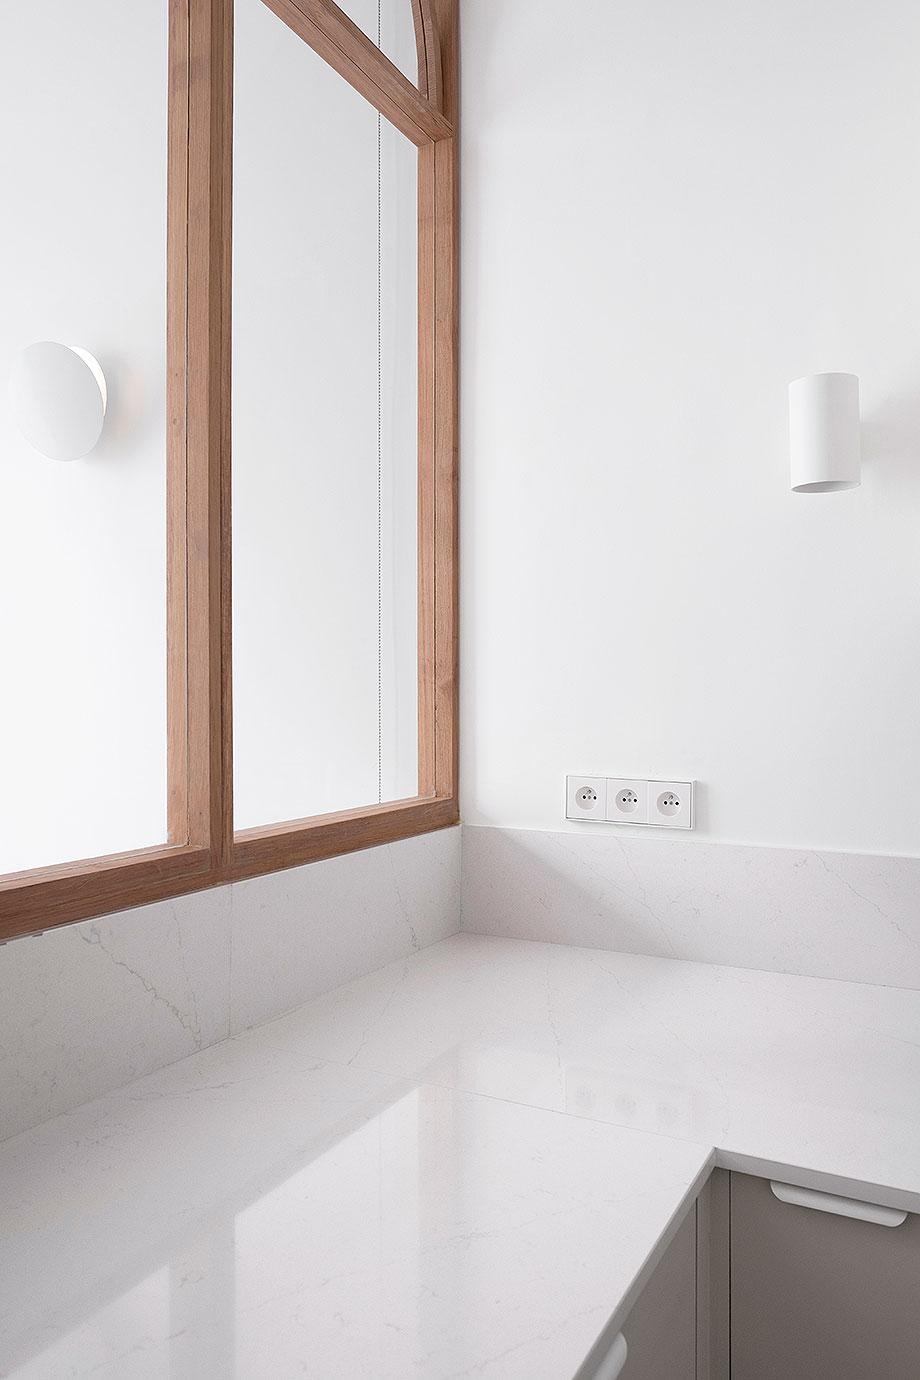 reforma integral de un apartamento en paris por anthropie architecture (s) (6) - foto juliette alexandre